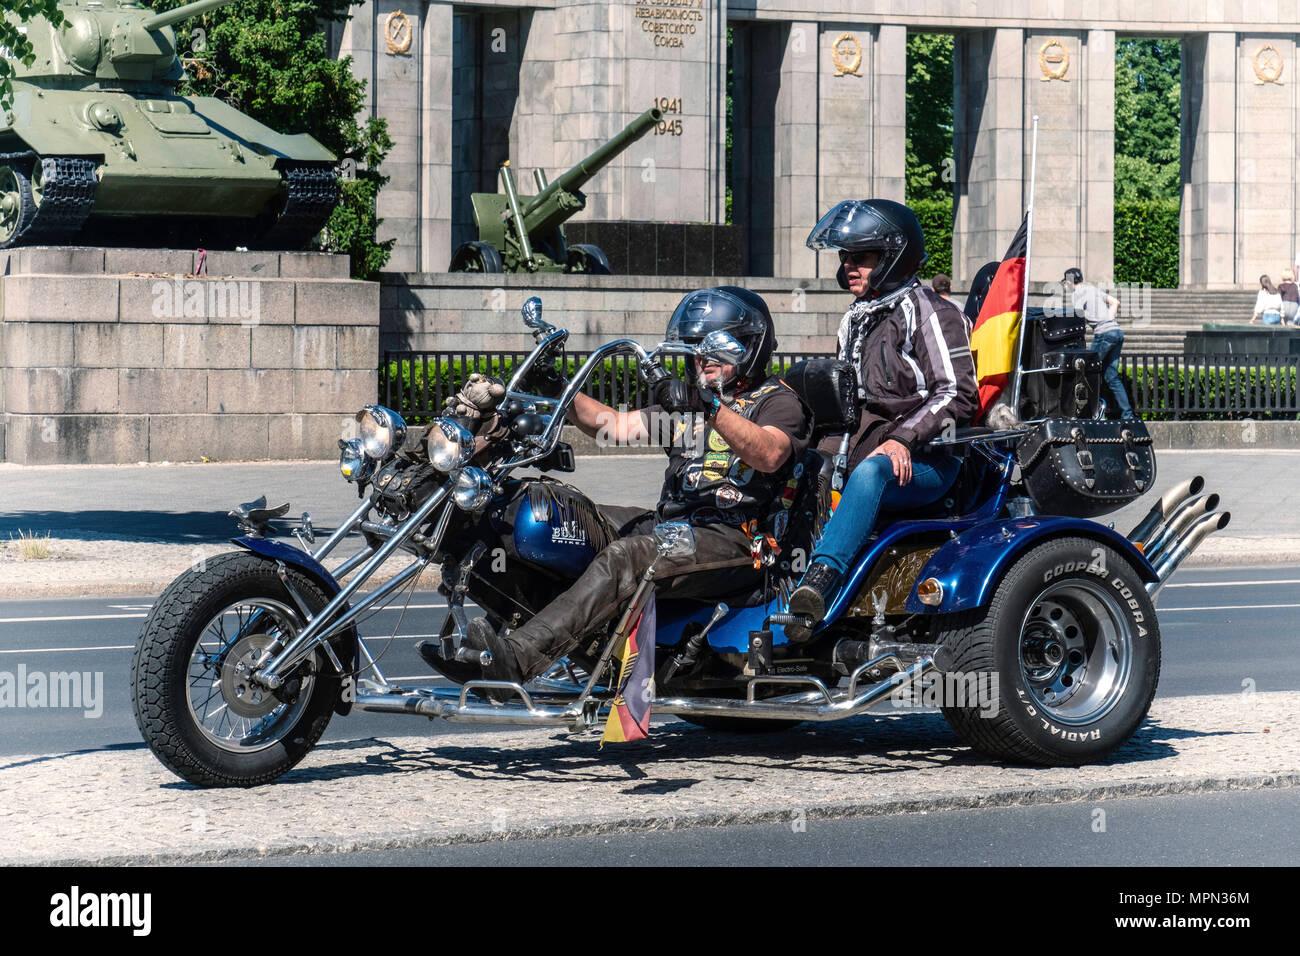 Berlin Mitte, Motor biker and passenger on three wheeler in front of Soviet War memorial. Hundreds of Bikers protest at the Brandenburg Gate for prote - Stock Image